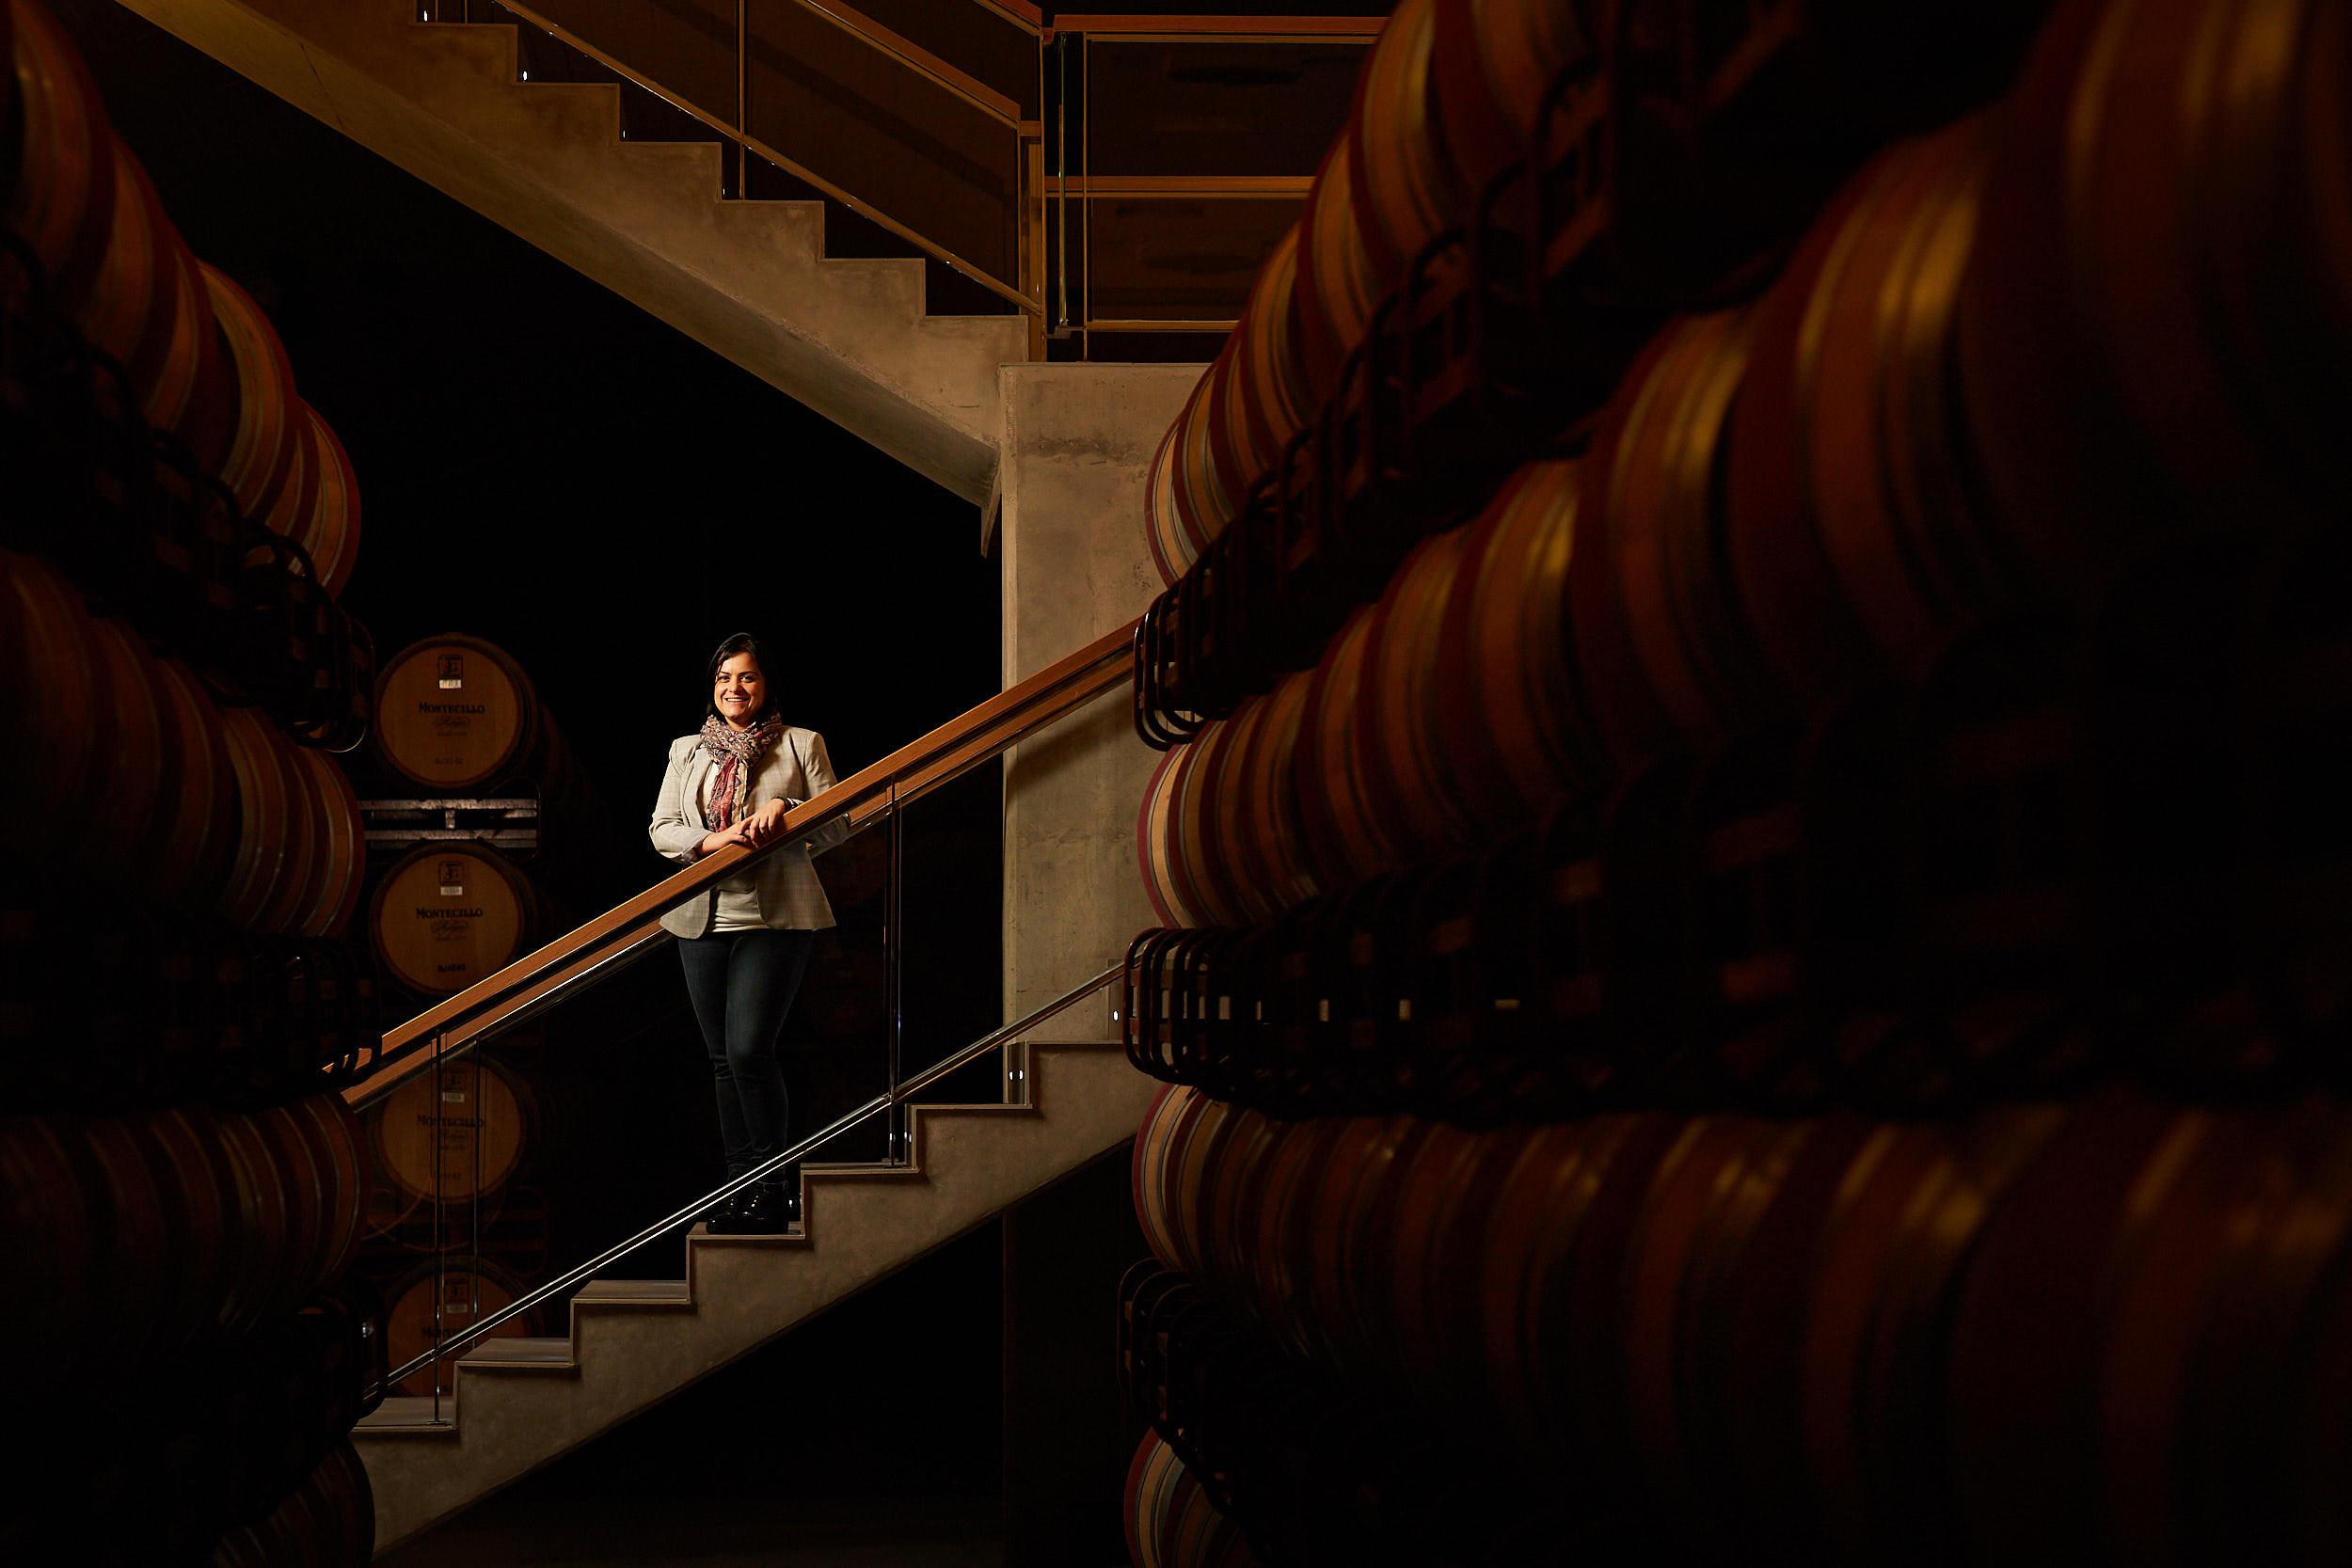 1805Commercial-professional-wine-photography-la-rioja-spain-James-Sturcke_0021.jpg